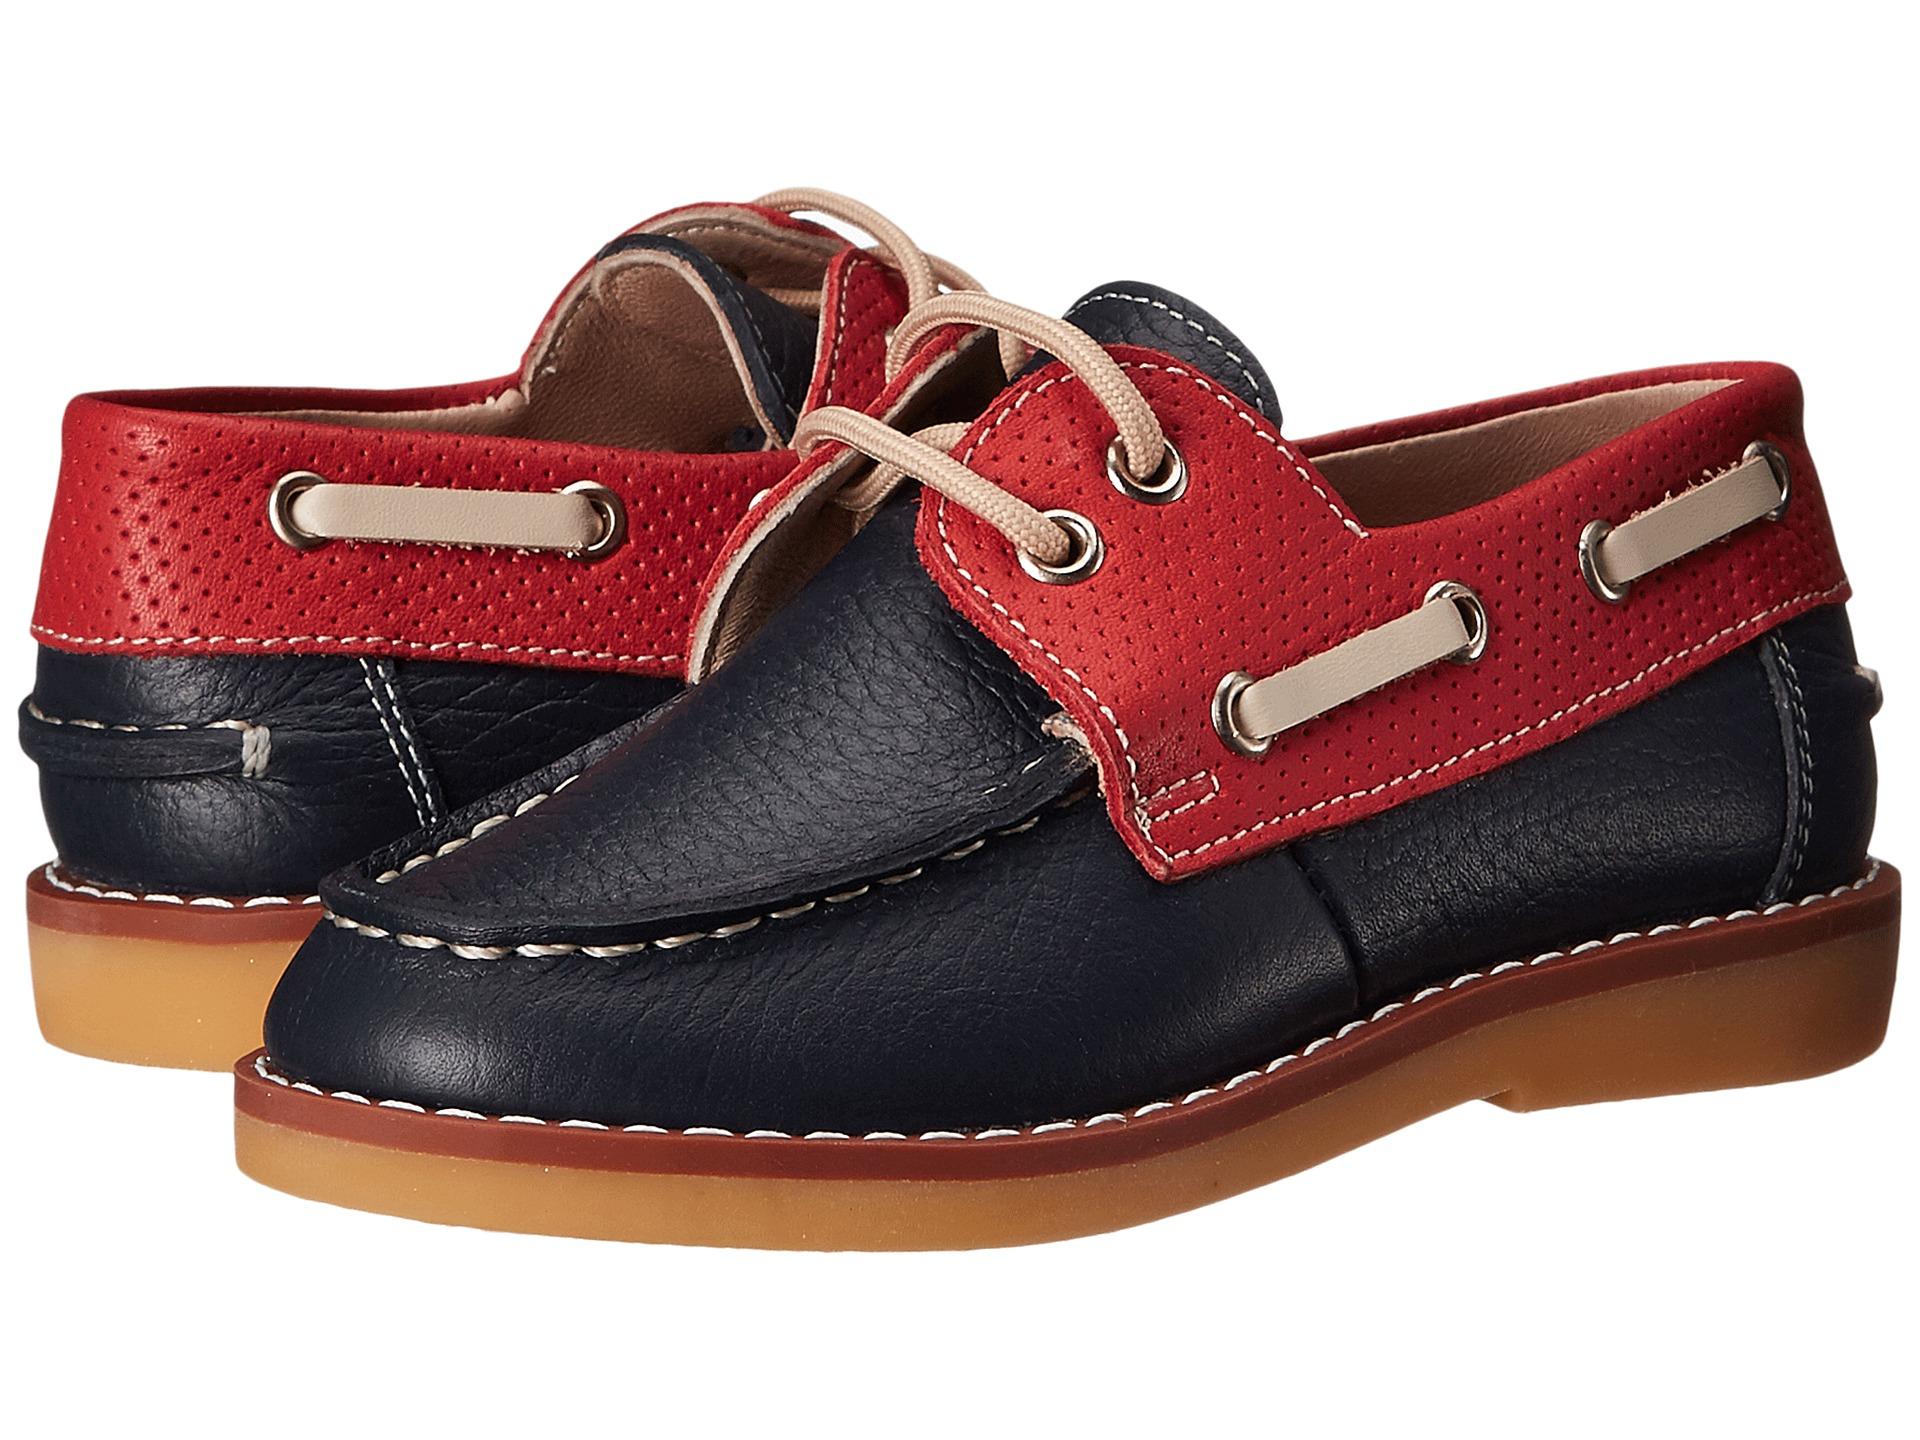 Elephantito Boat Shoes Toddler Little Kid Big Kid